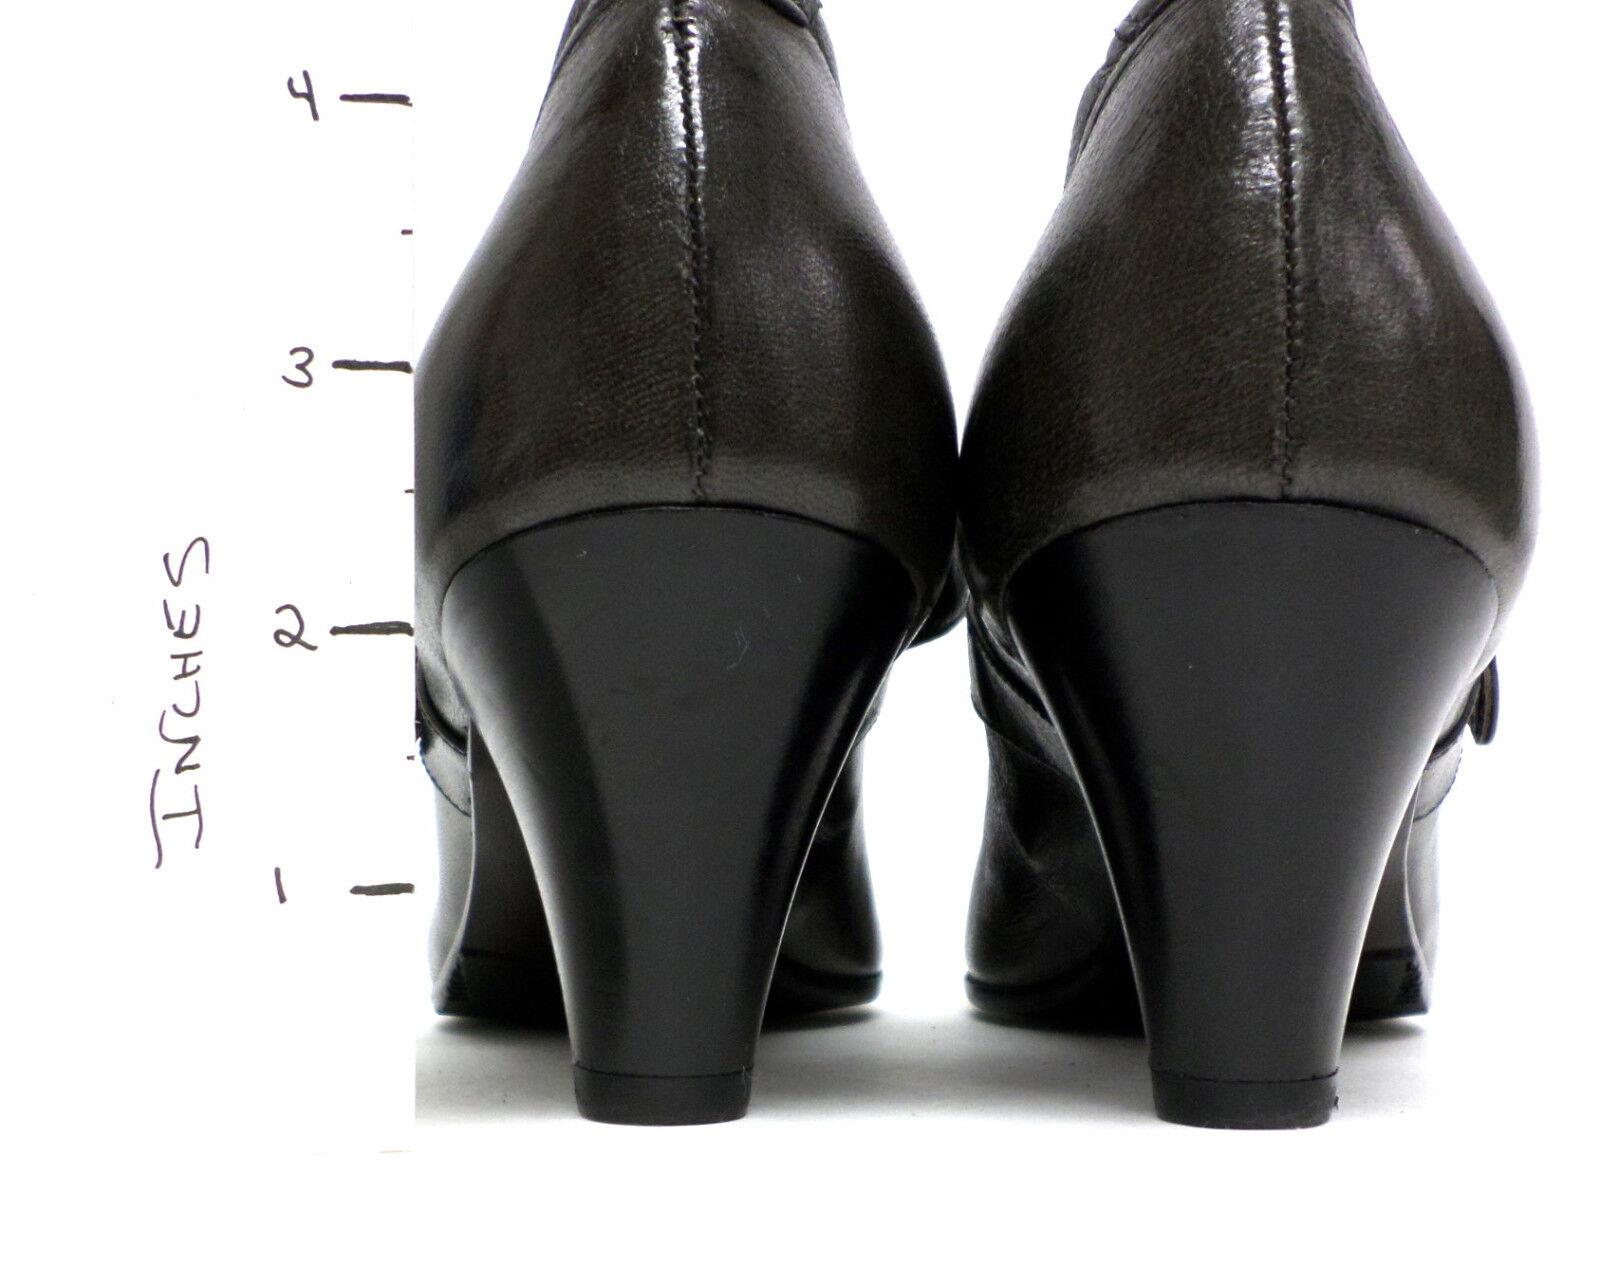 New Heel ALBERTO FERMANI Olive Green Größe 9 Mary Jane Heel New Pumps or Schuhes 40 6e15af